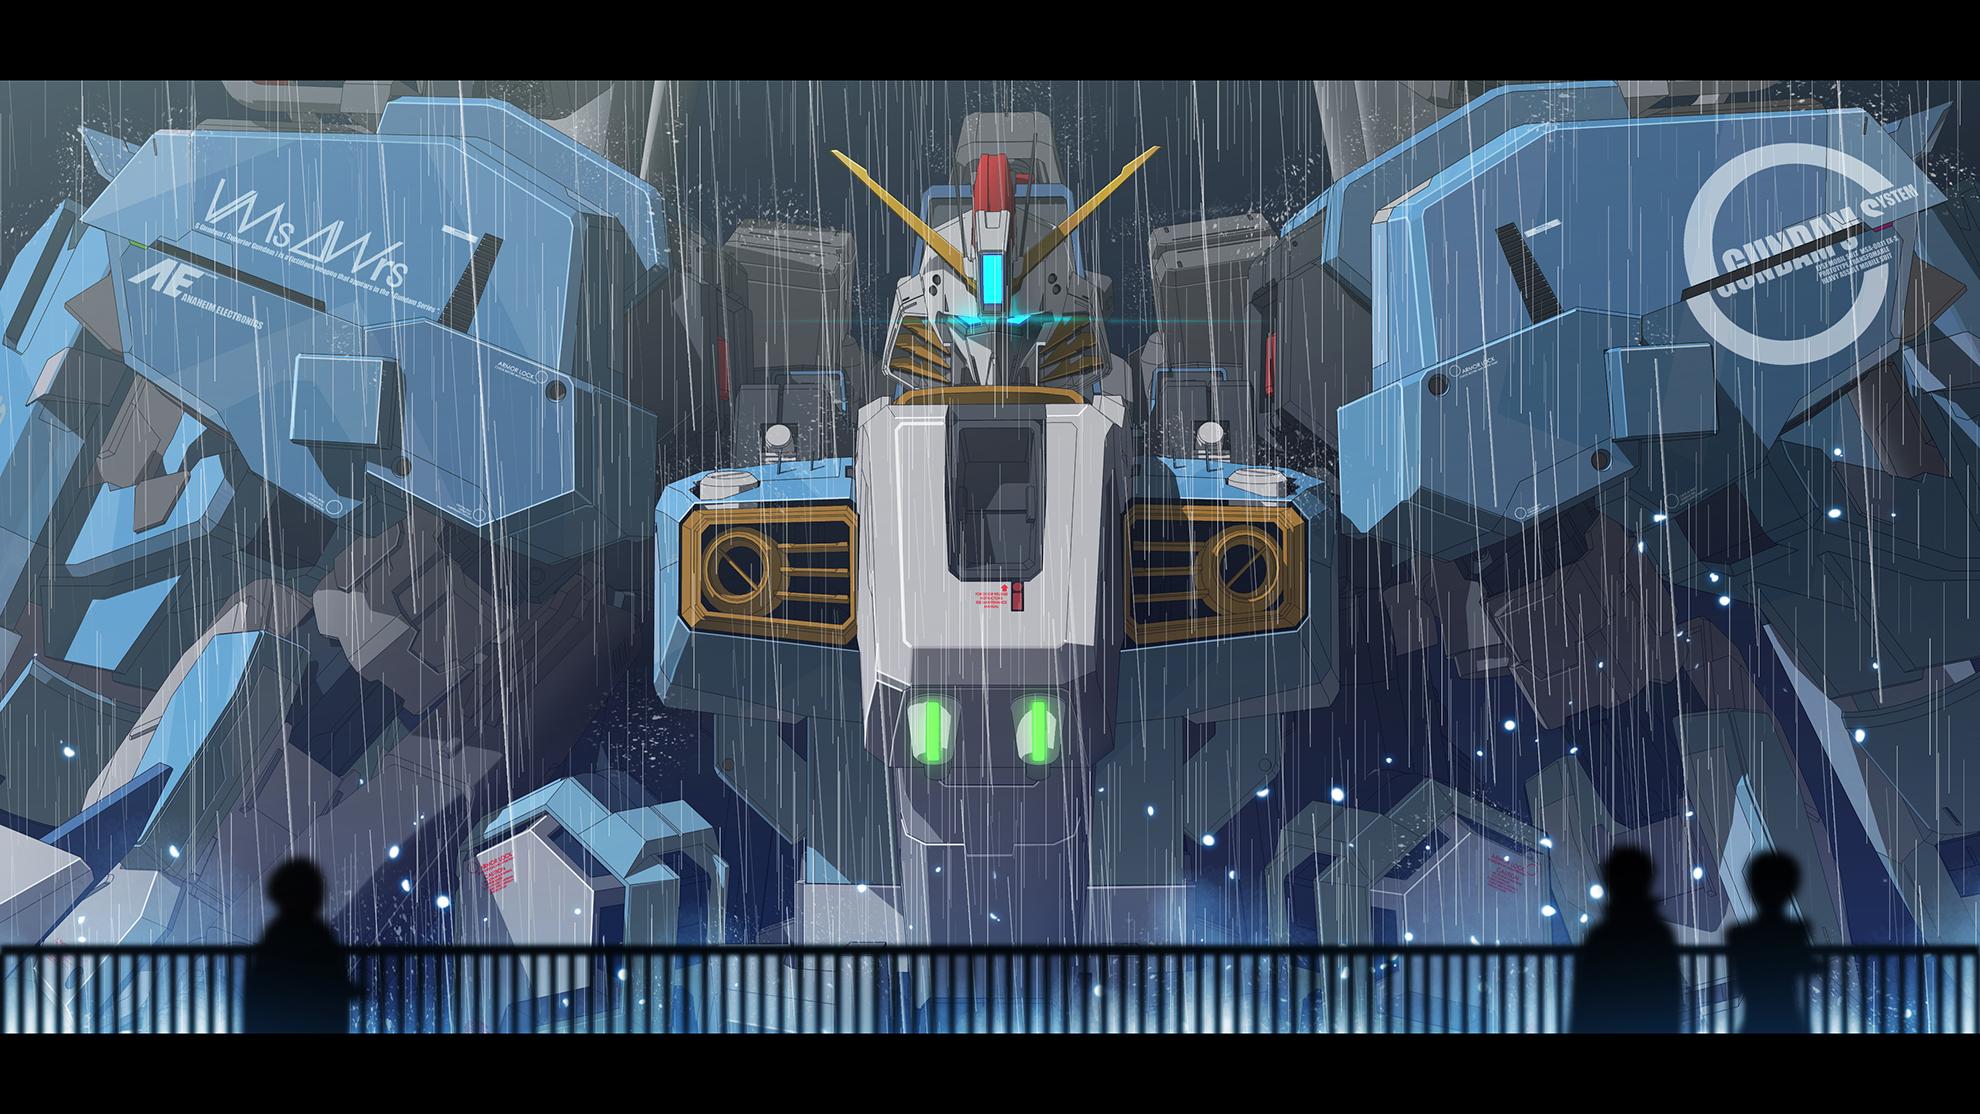 Msa 0011 Ex S Gundam Image 2380499 Zerochan Anime Image Board